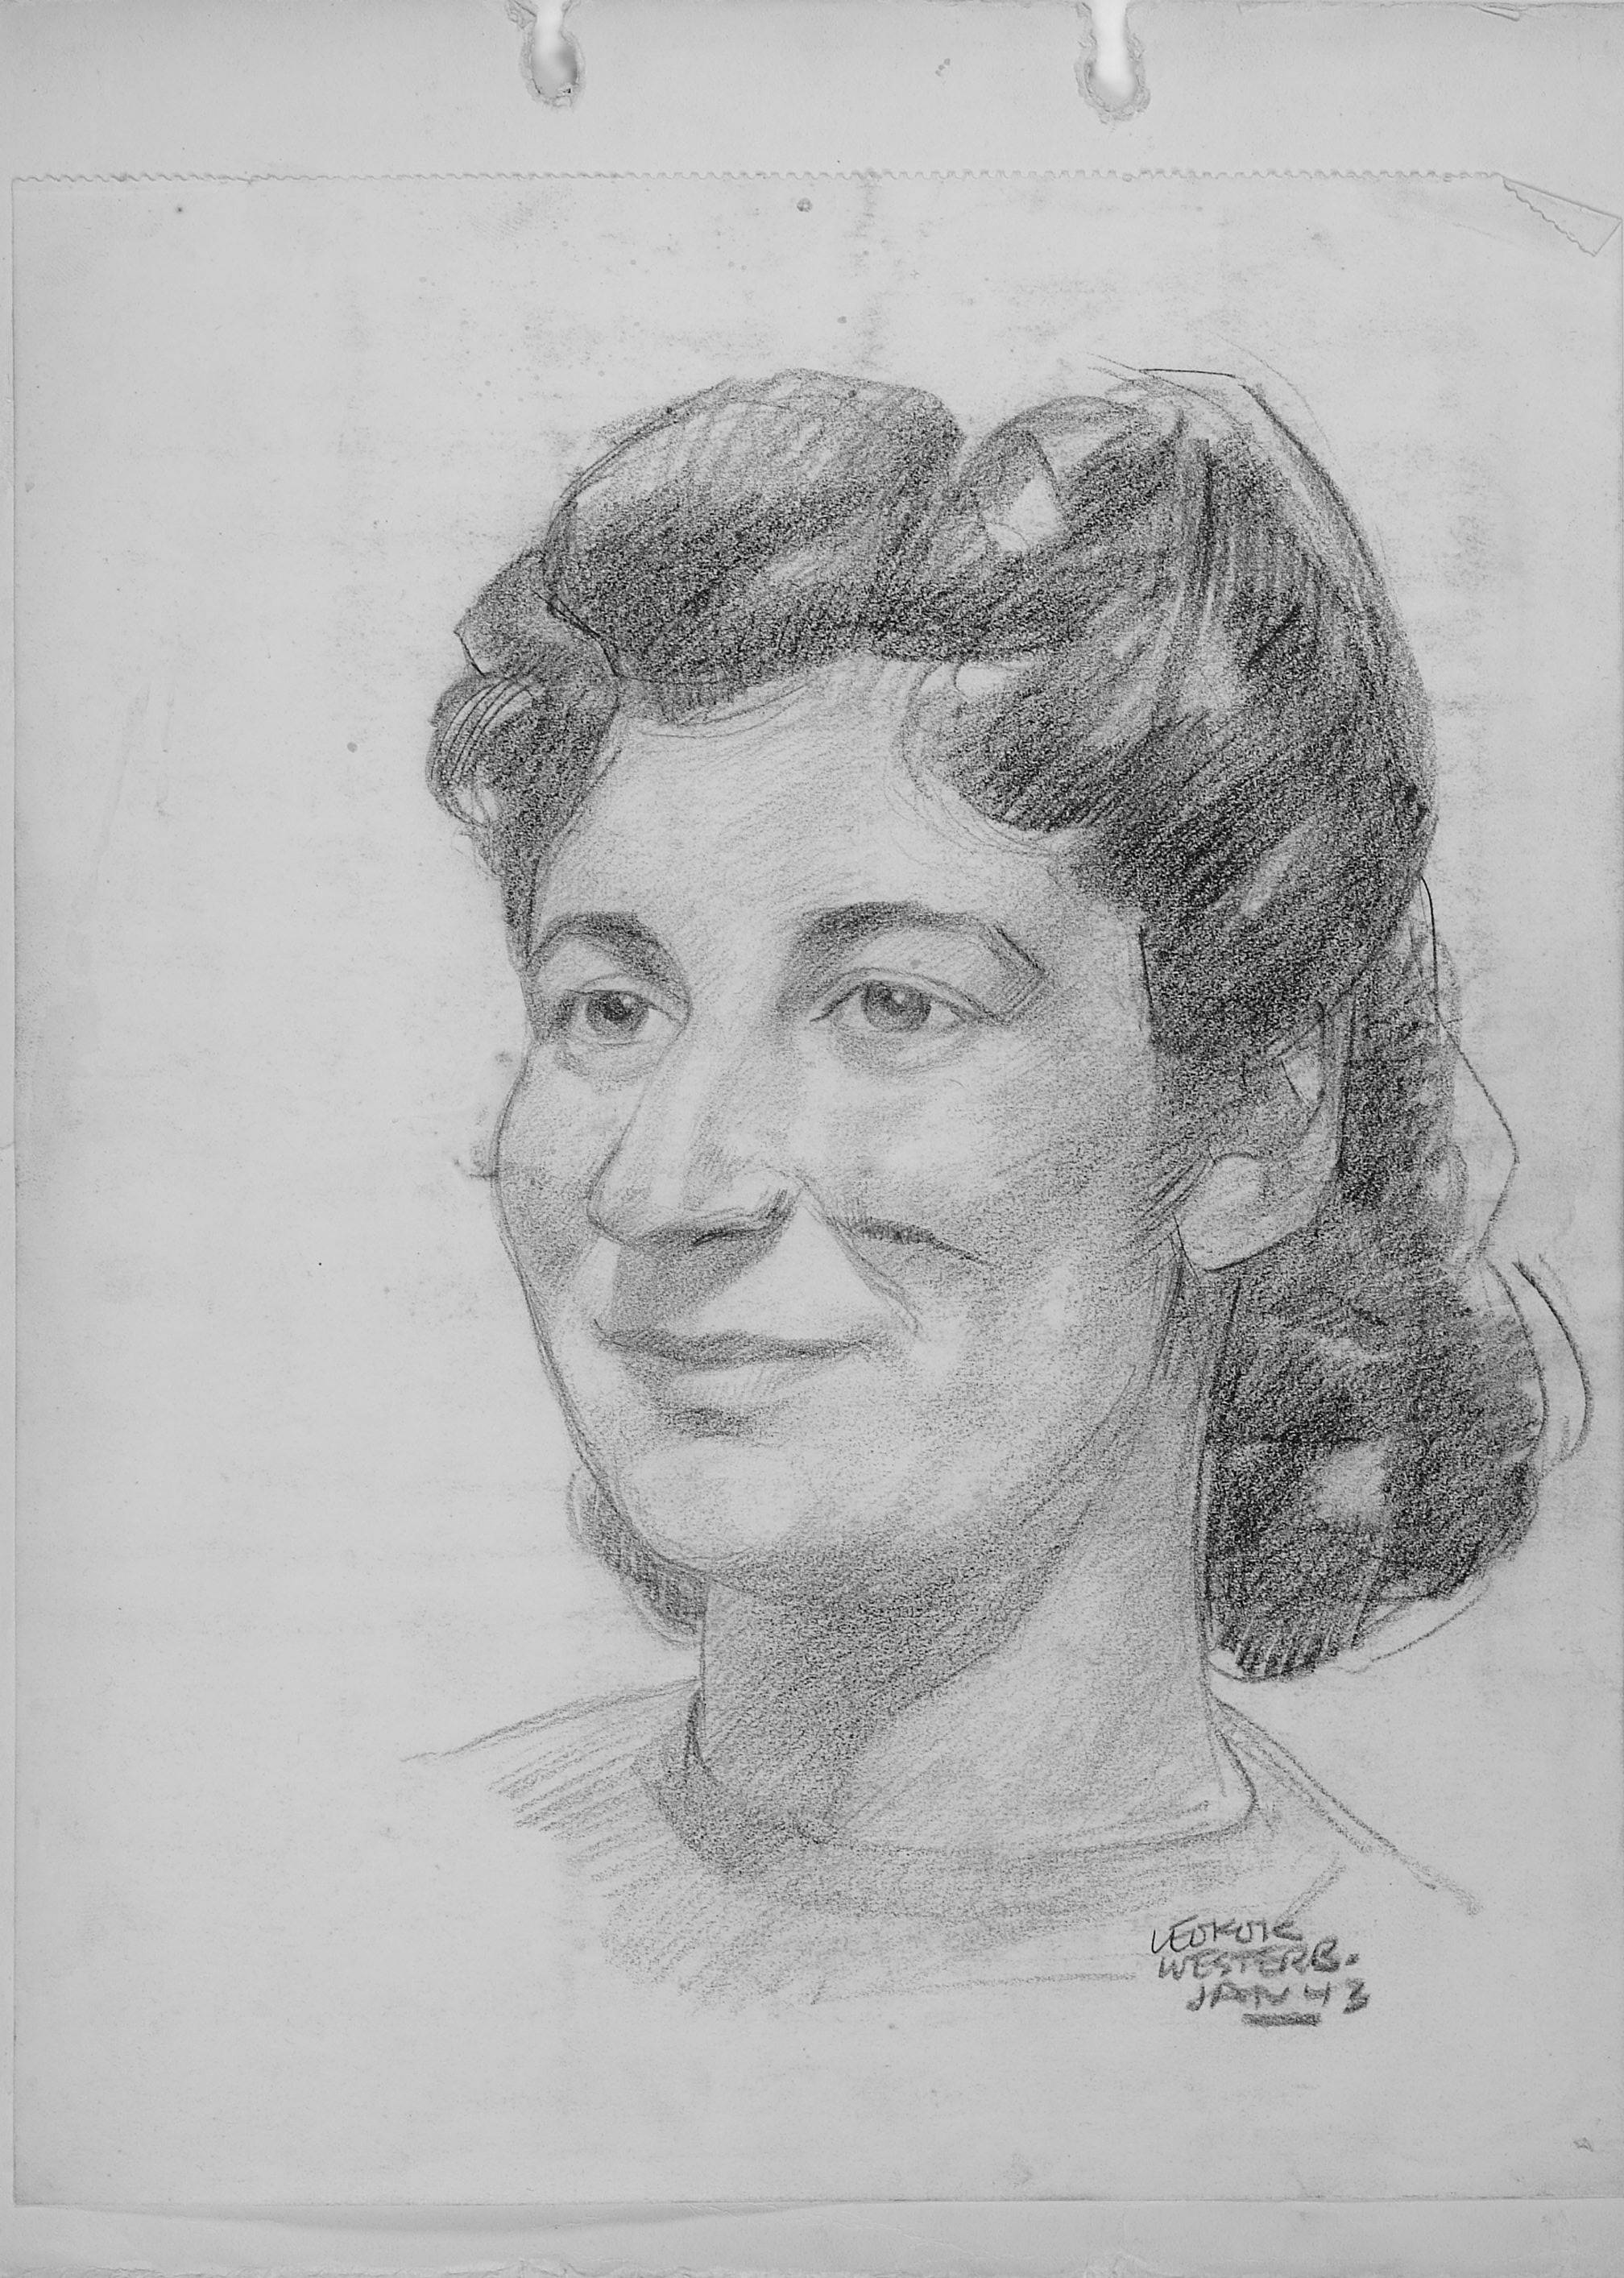 Johanna Kroonenberg